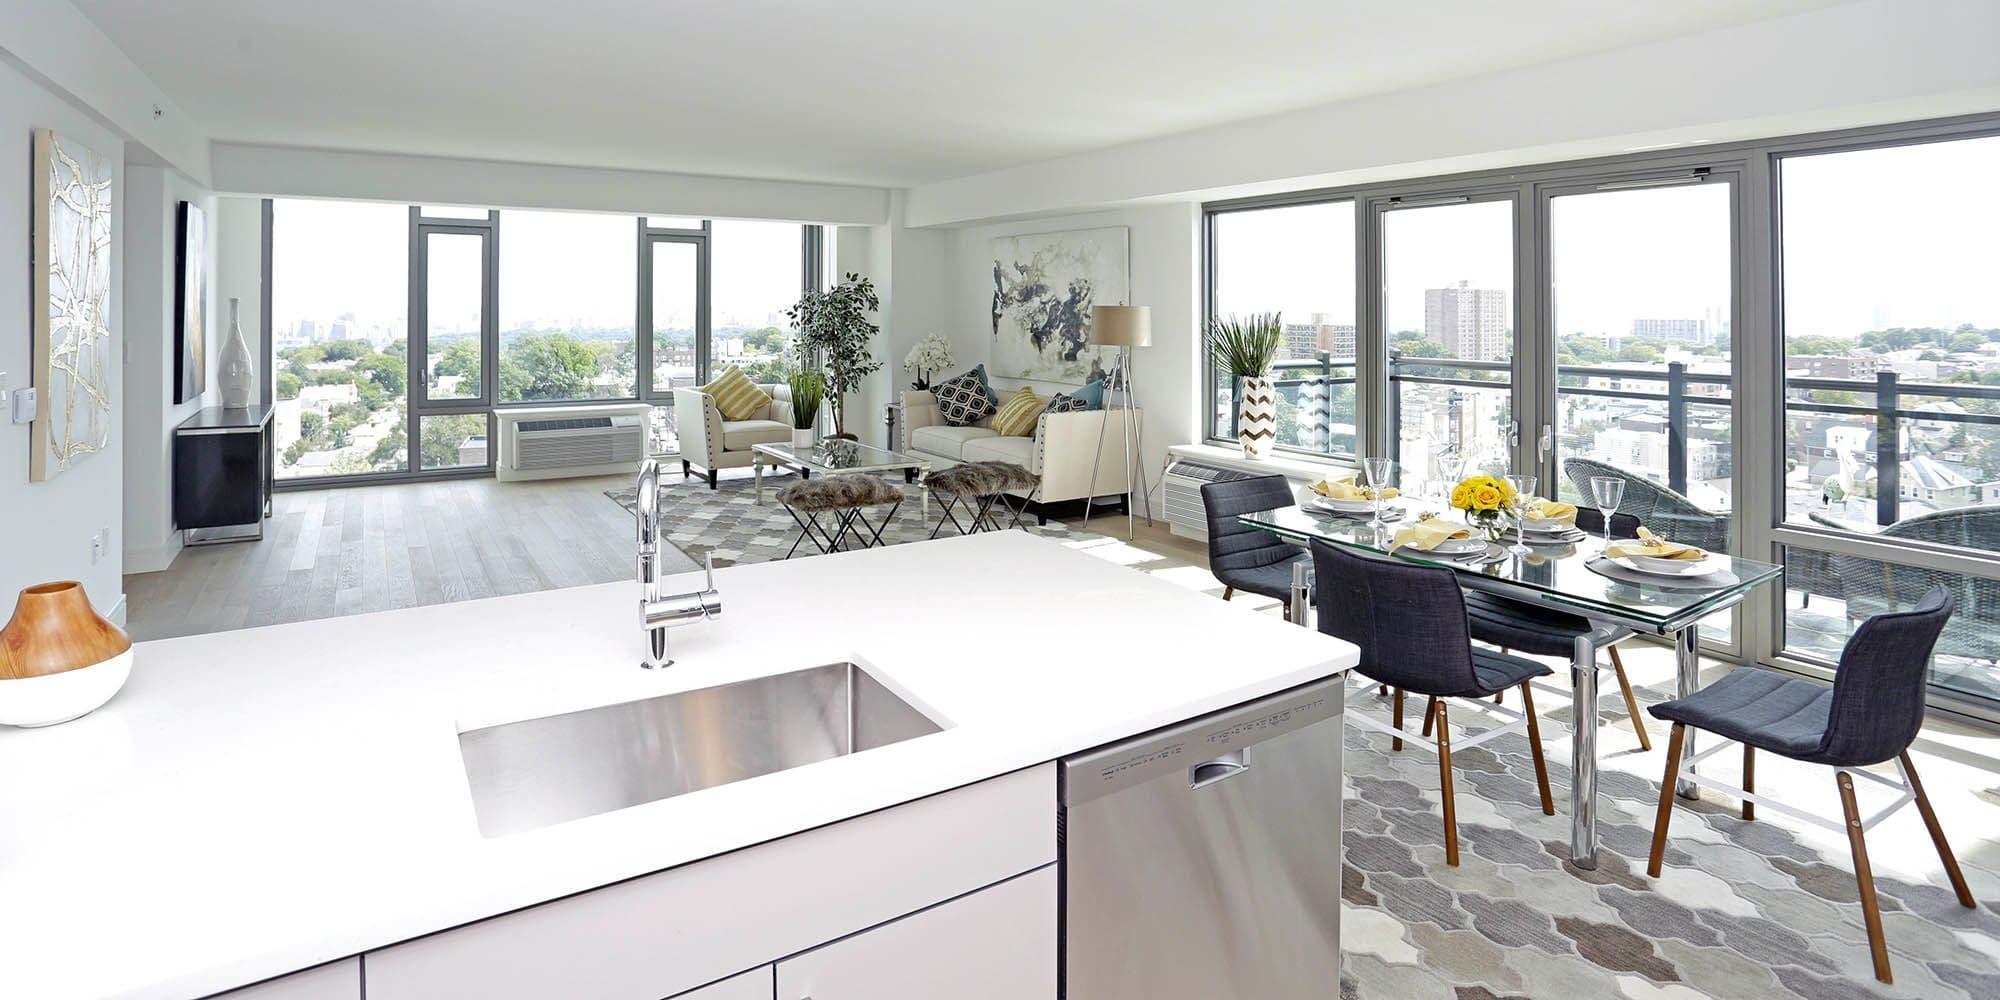 Cliffside Park, NJ Apartments for Rent near Edgewater | The Centre